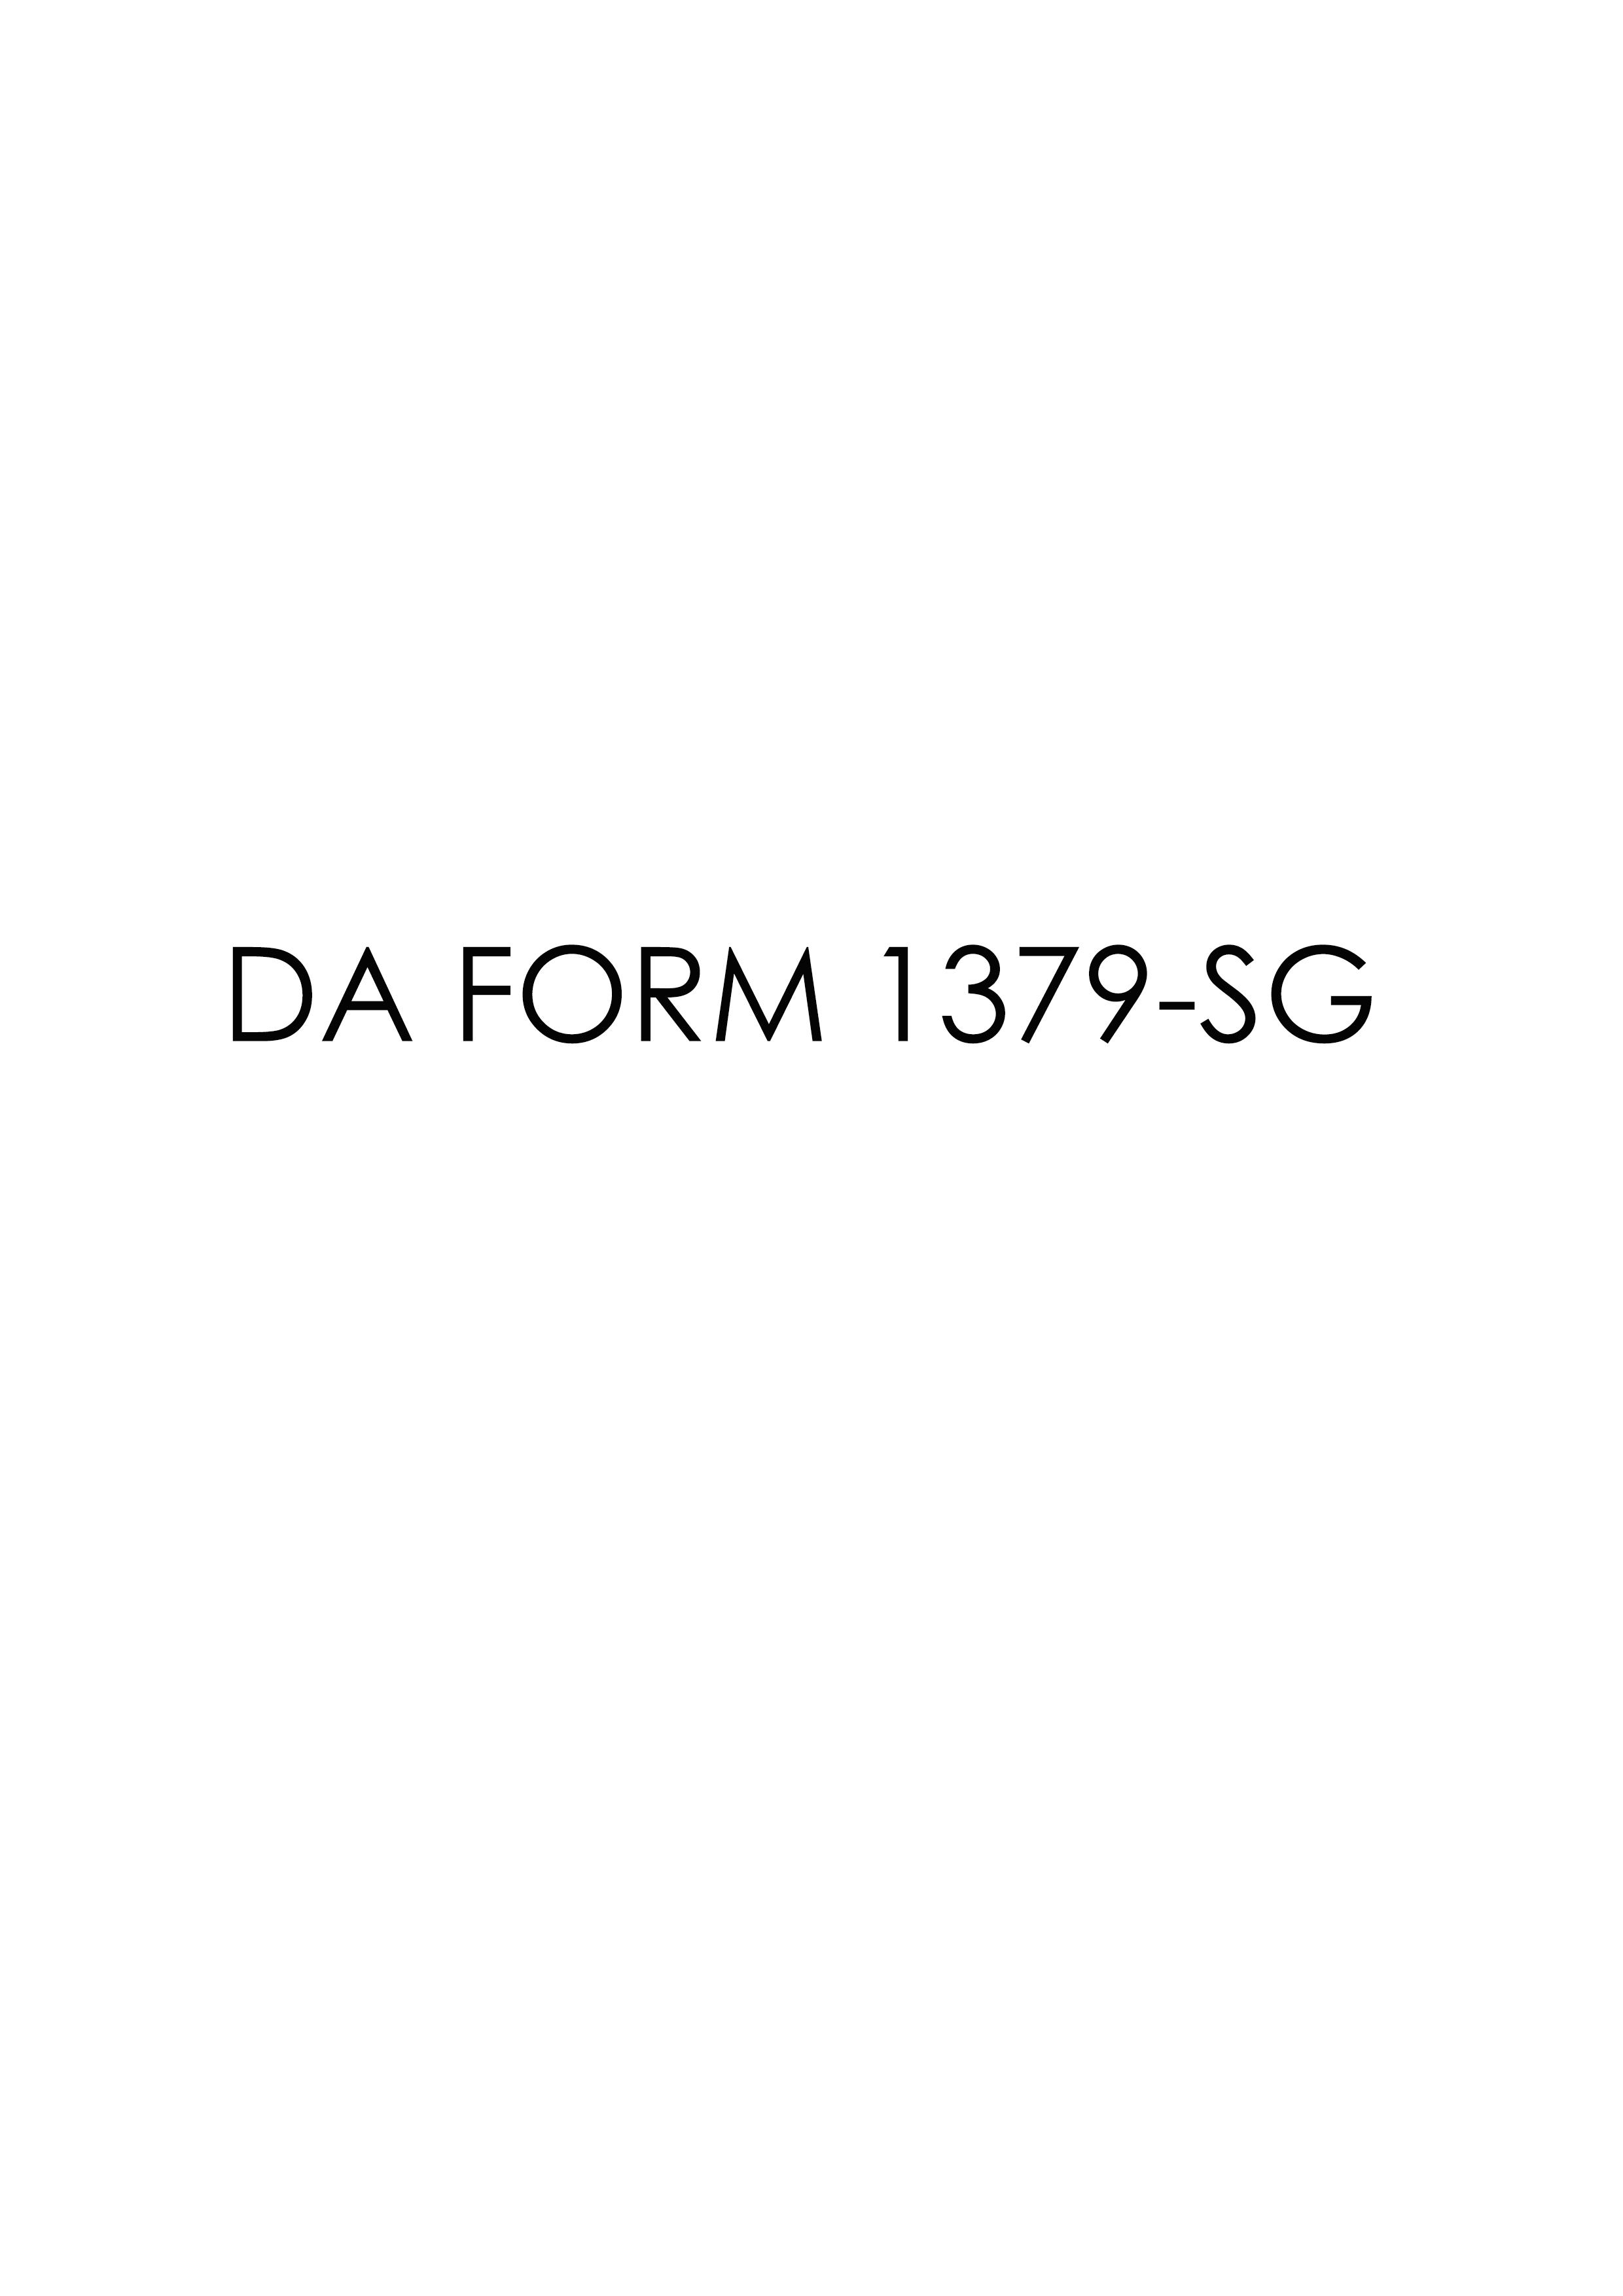 Download da Form 1379-SG Free